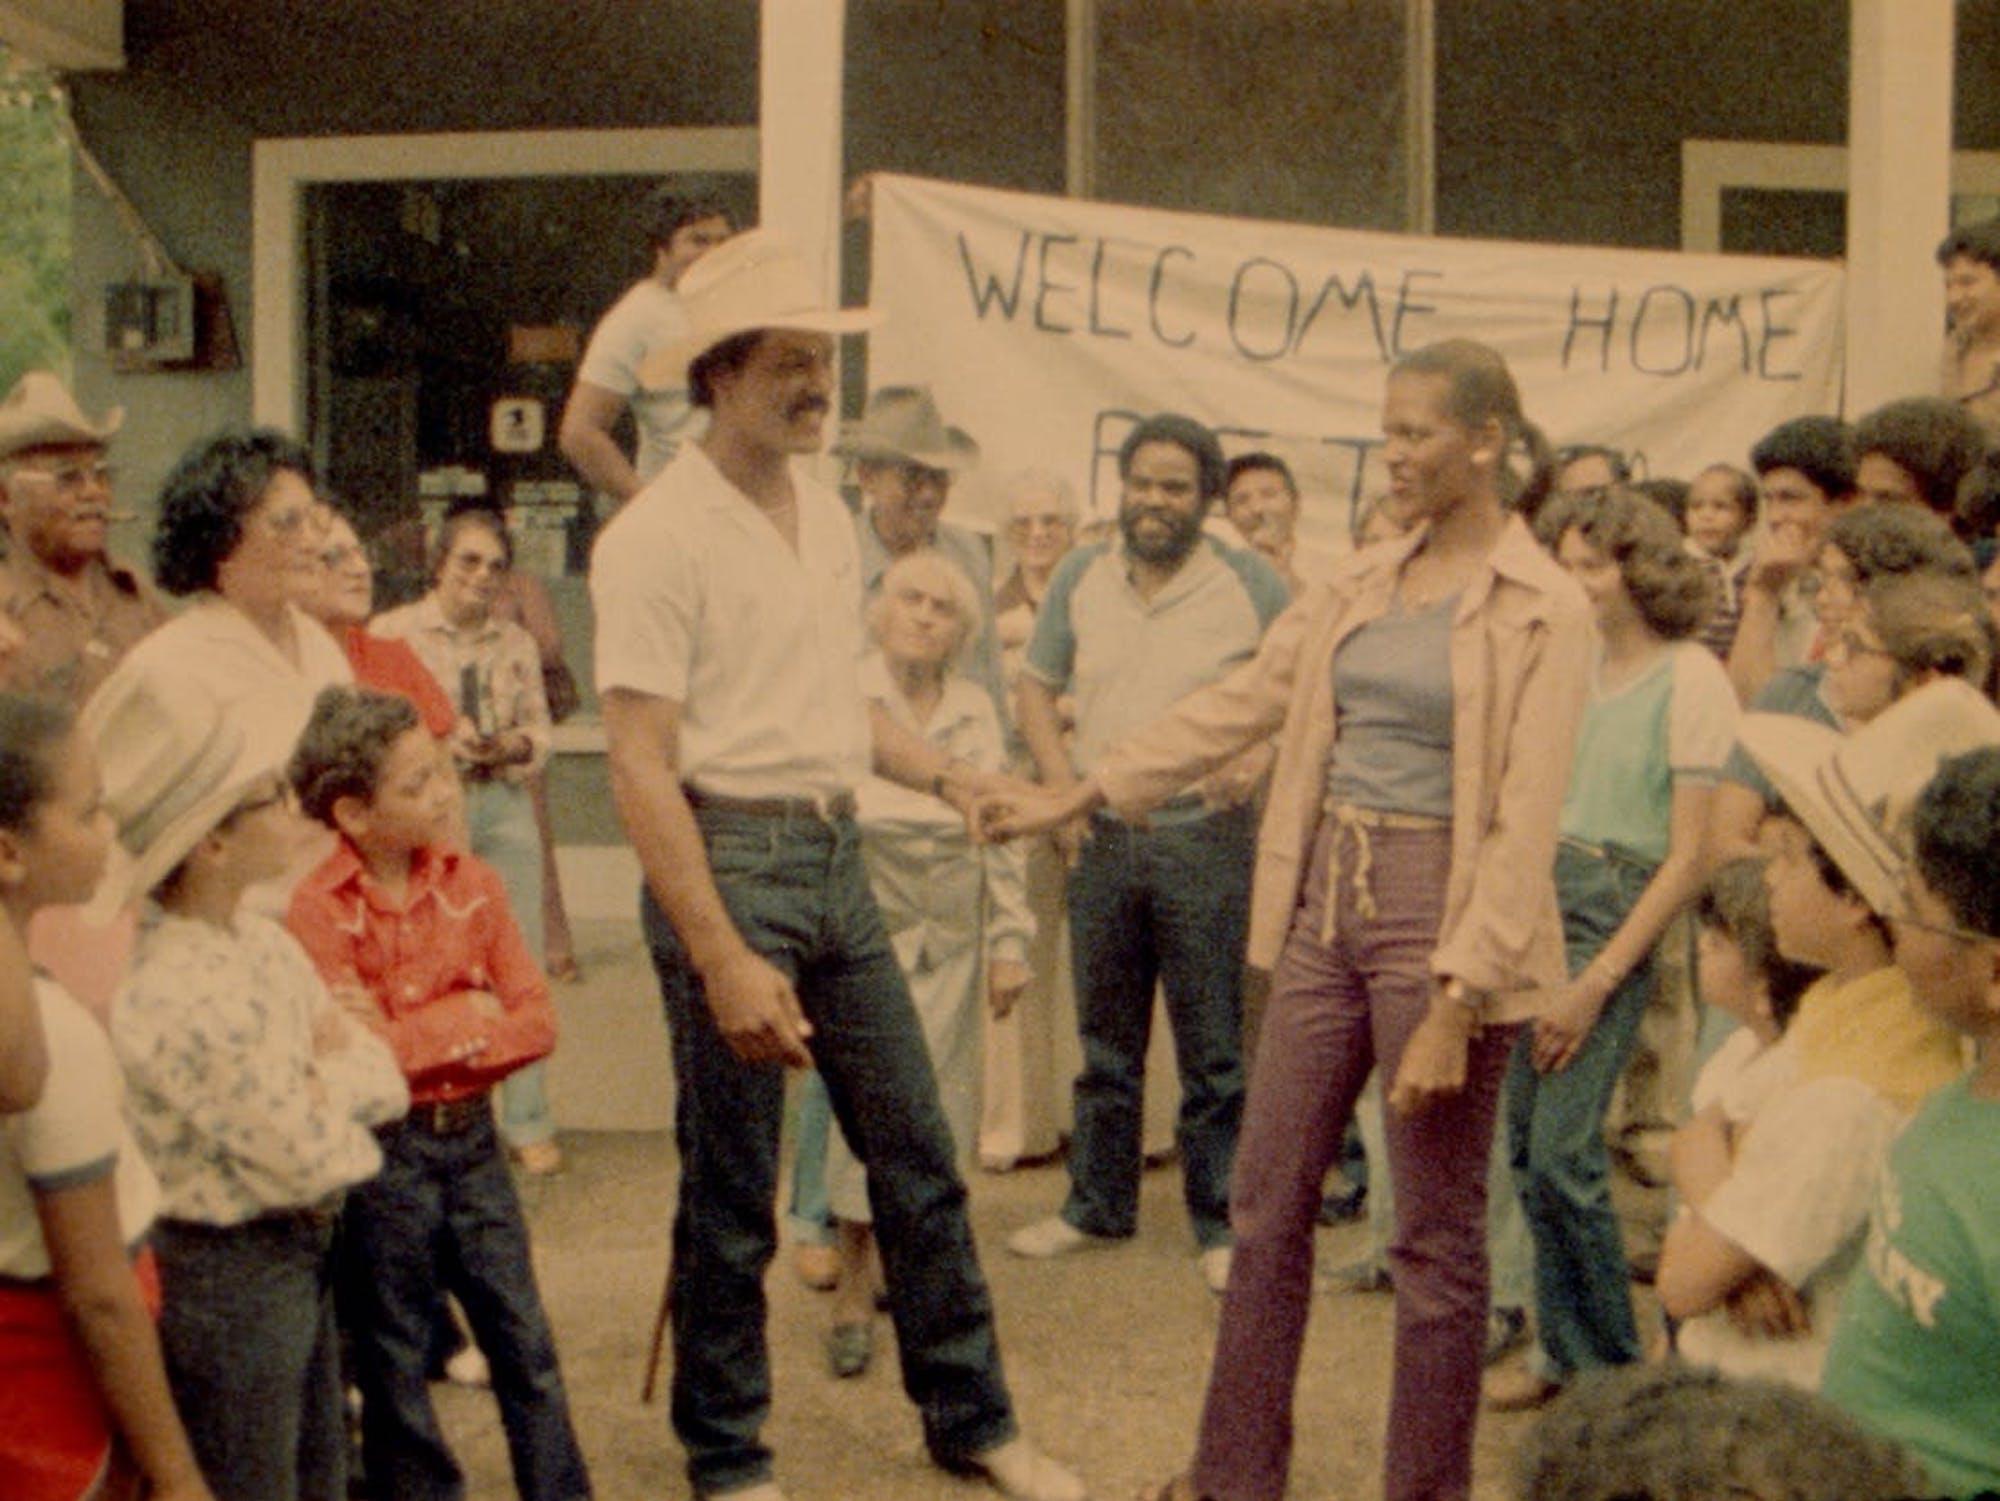 Cane River, Horace B. Jenkins, African American Film, Black Film, African American Cinema, Black Cineme, KOLUMN Magazine, KOLUMN, KINDR'D Magazine, KINDR'D, Willoughby Avenue, Wriit.